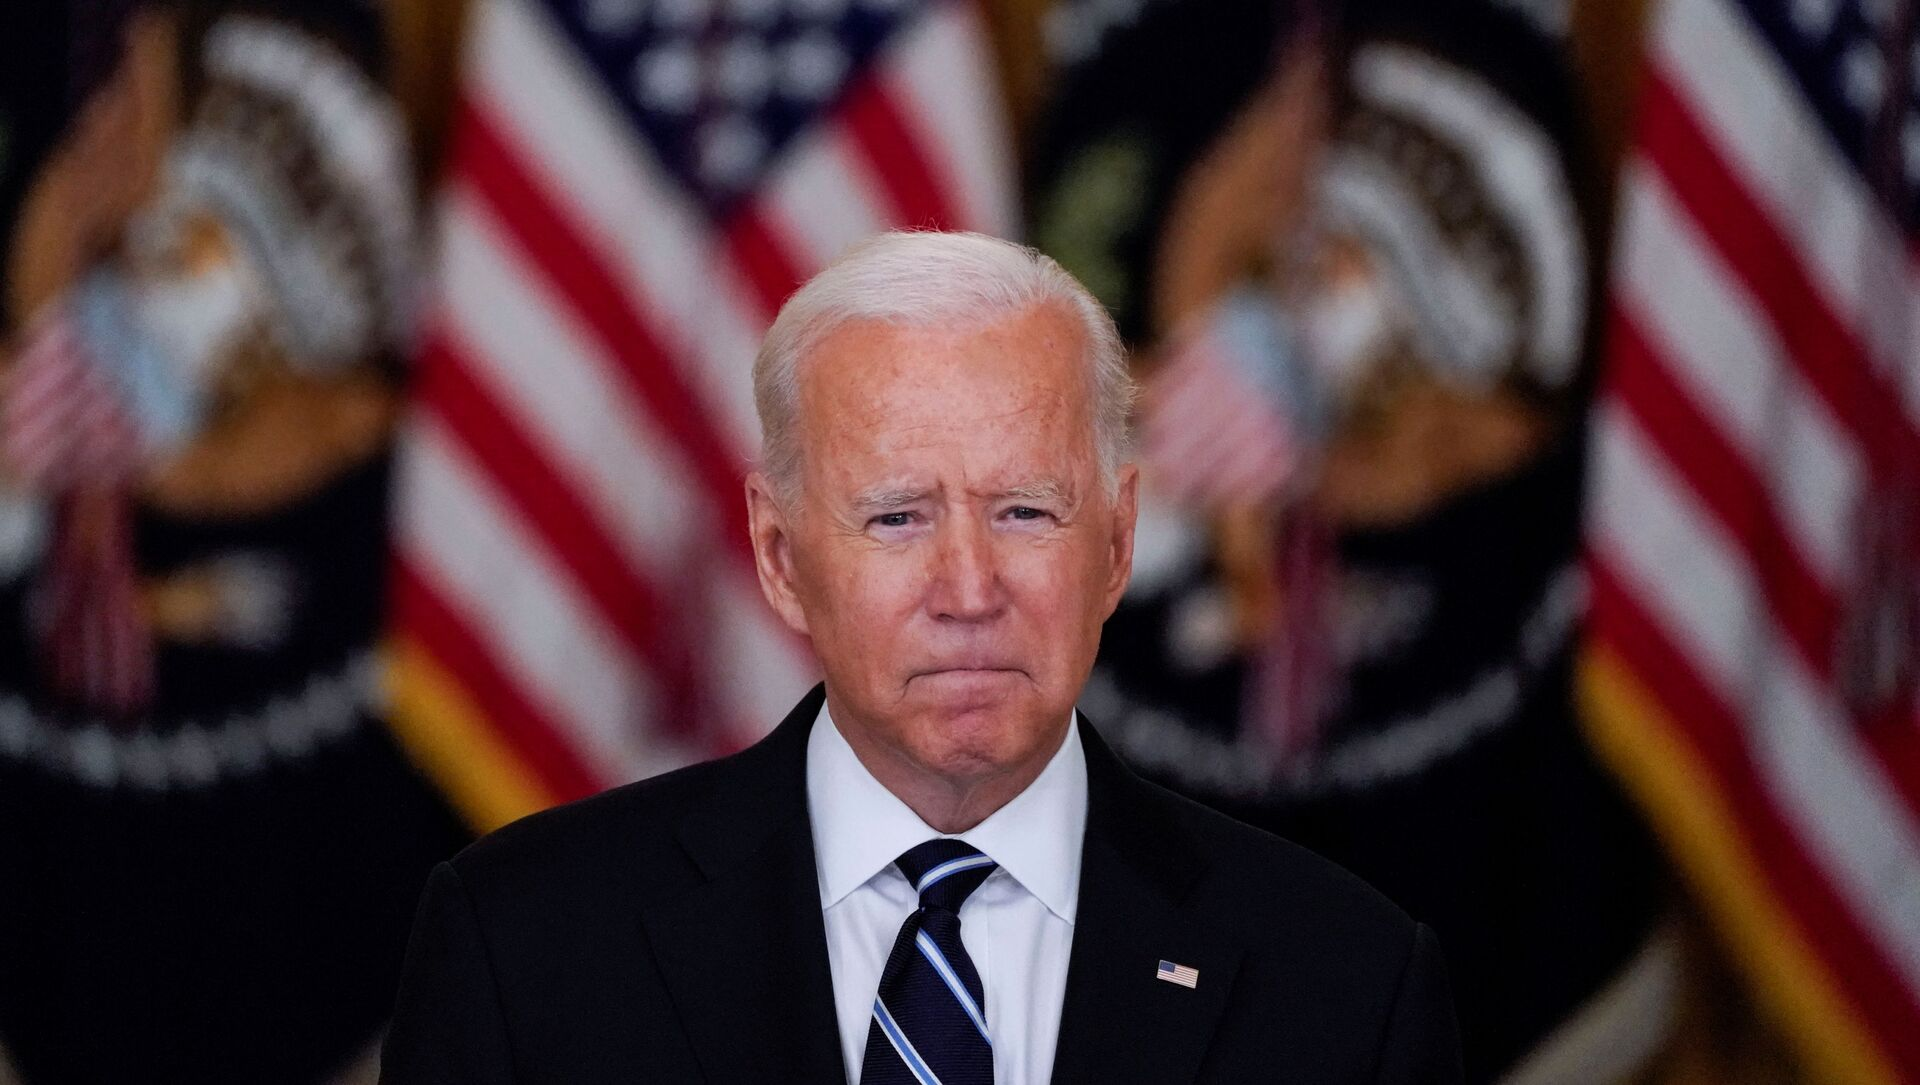 U.S. President Biden speaks about the coronavirus response and vaccination program at the White House in Washington - Sputnik International, 1920, 29.08.2021